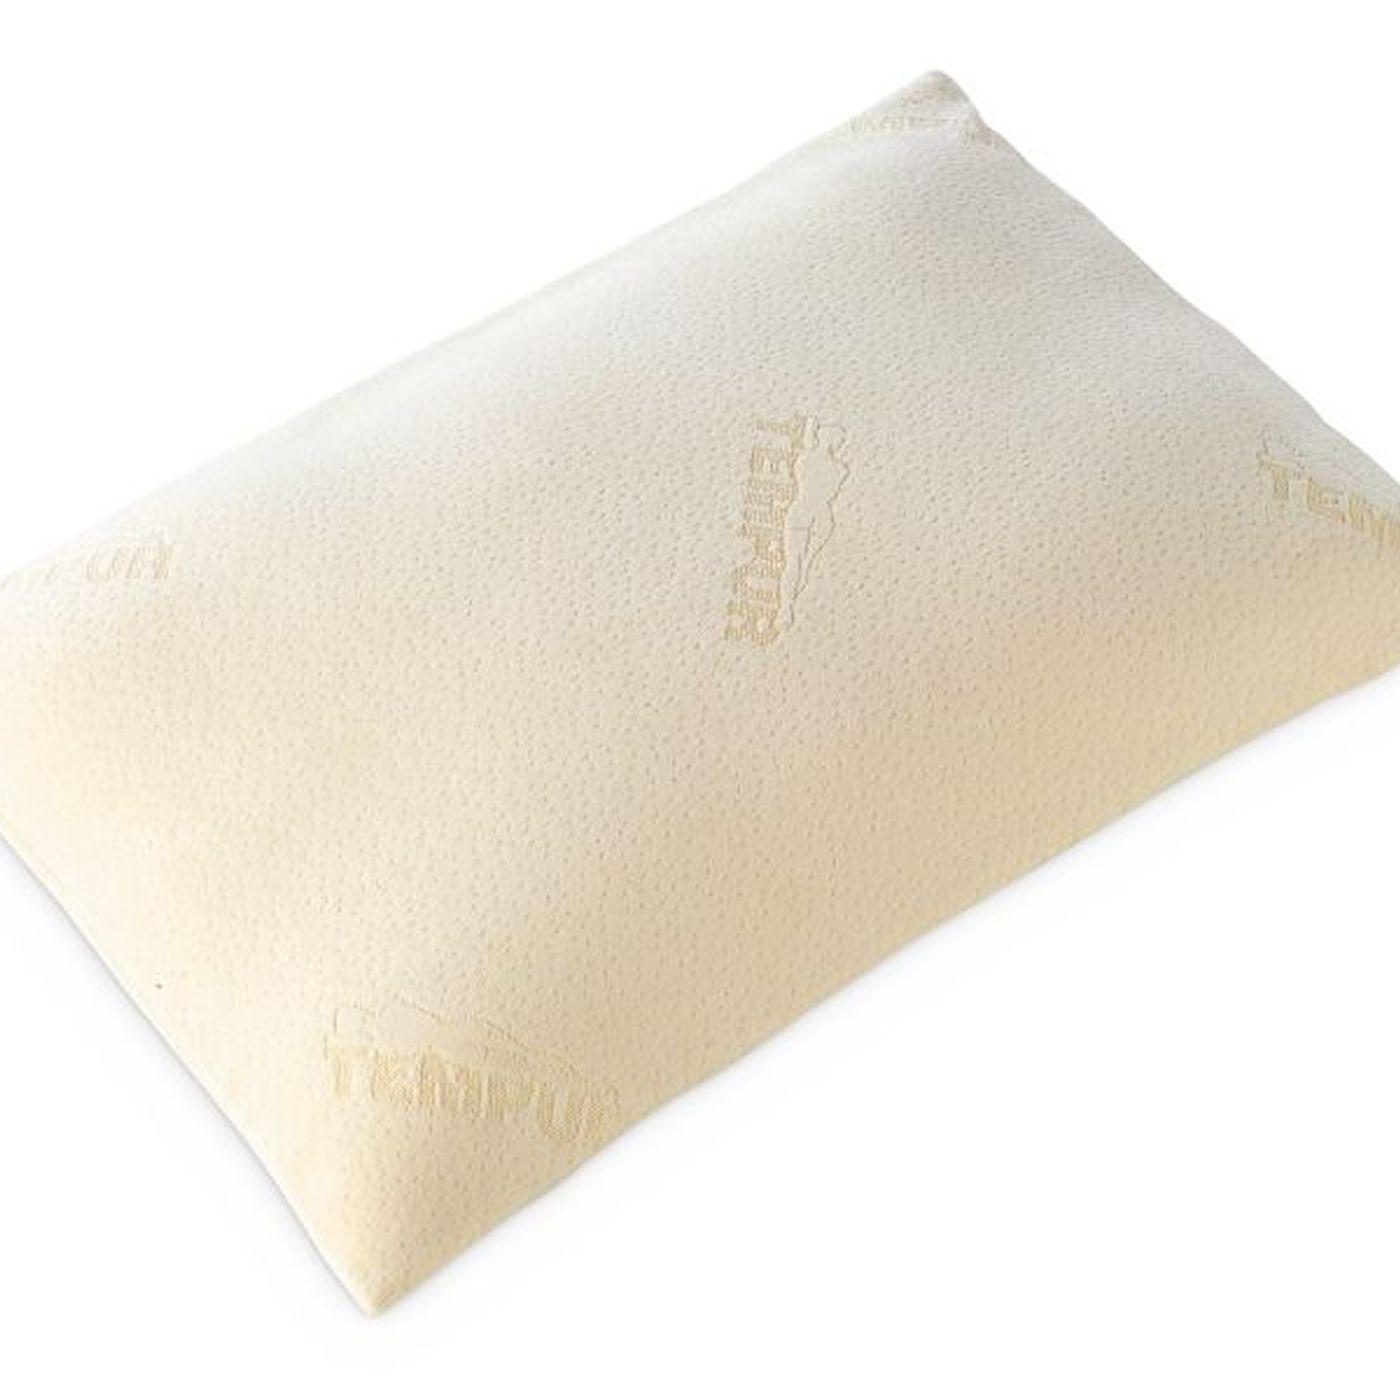 Cuscino tempur comfort alber arredorelax for Cuscini tempur